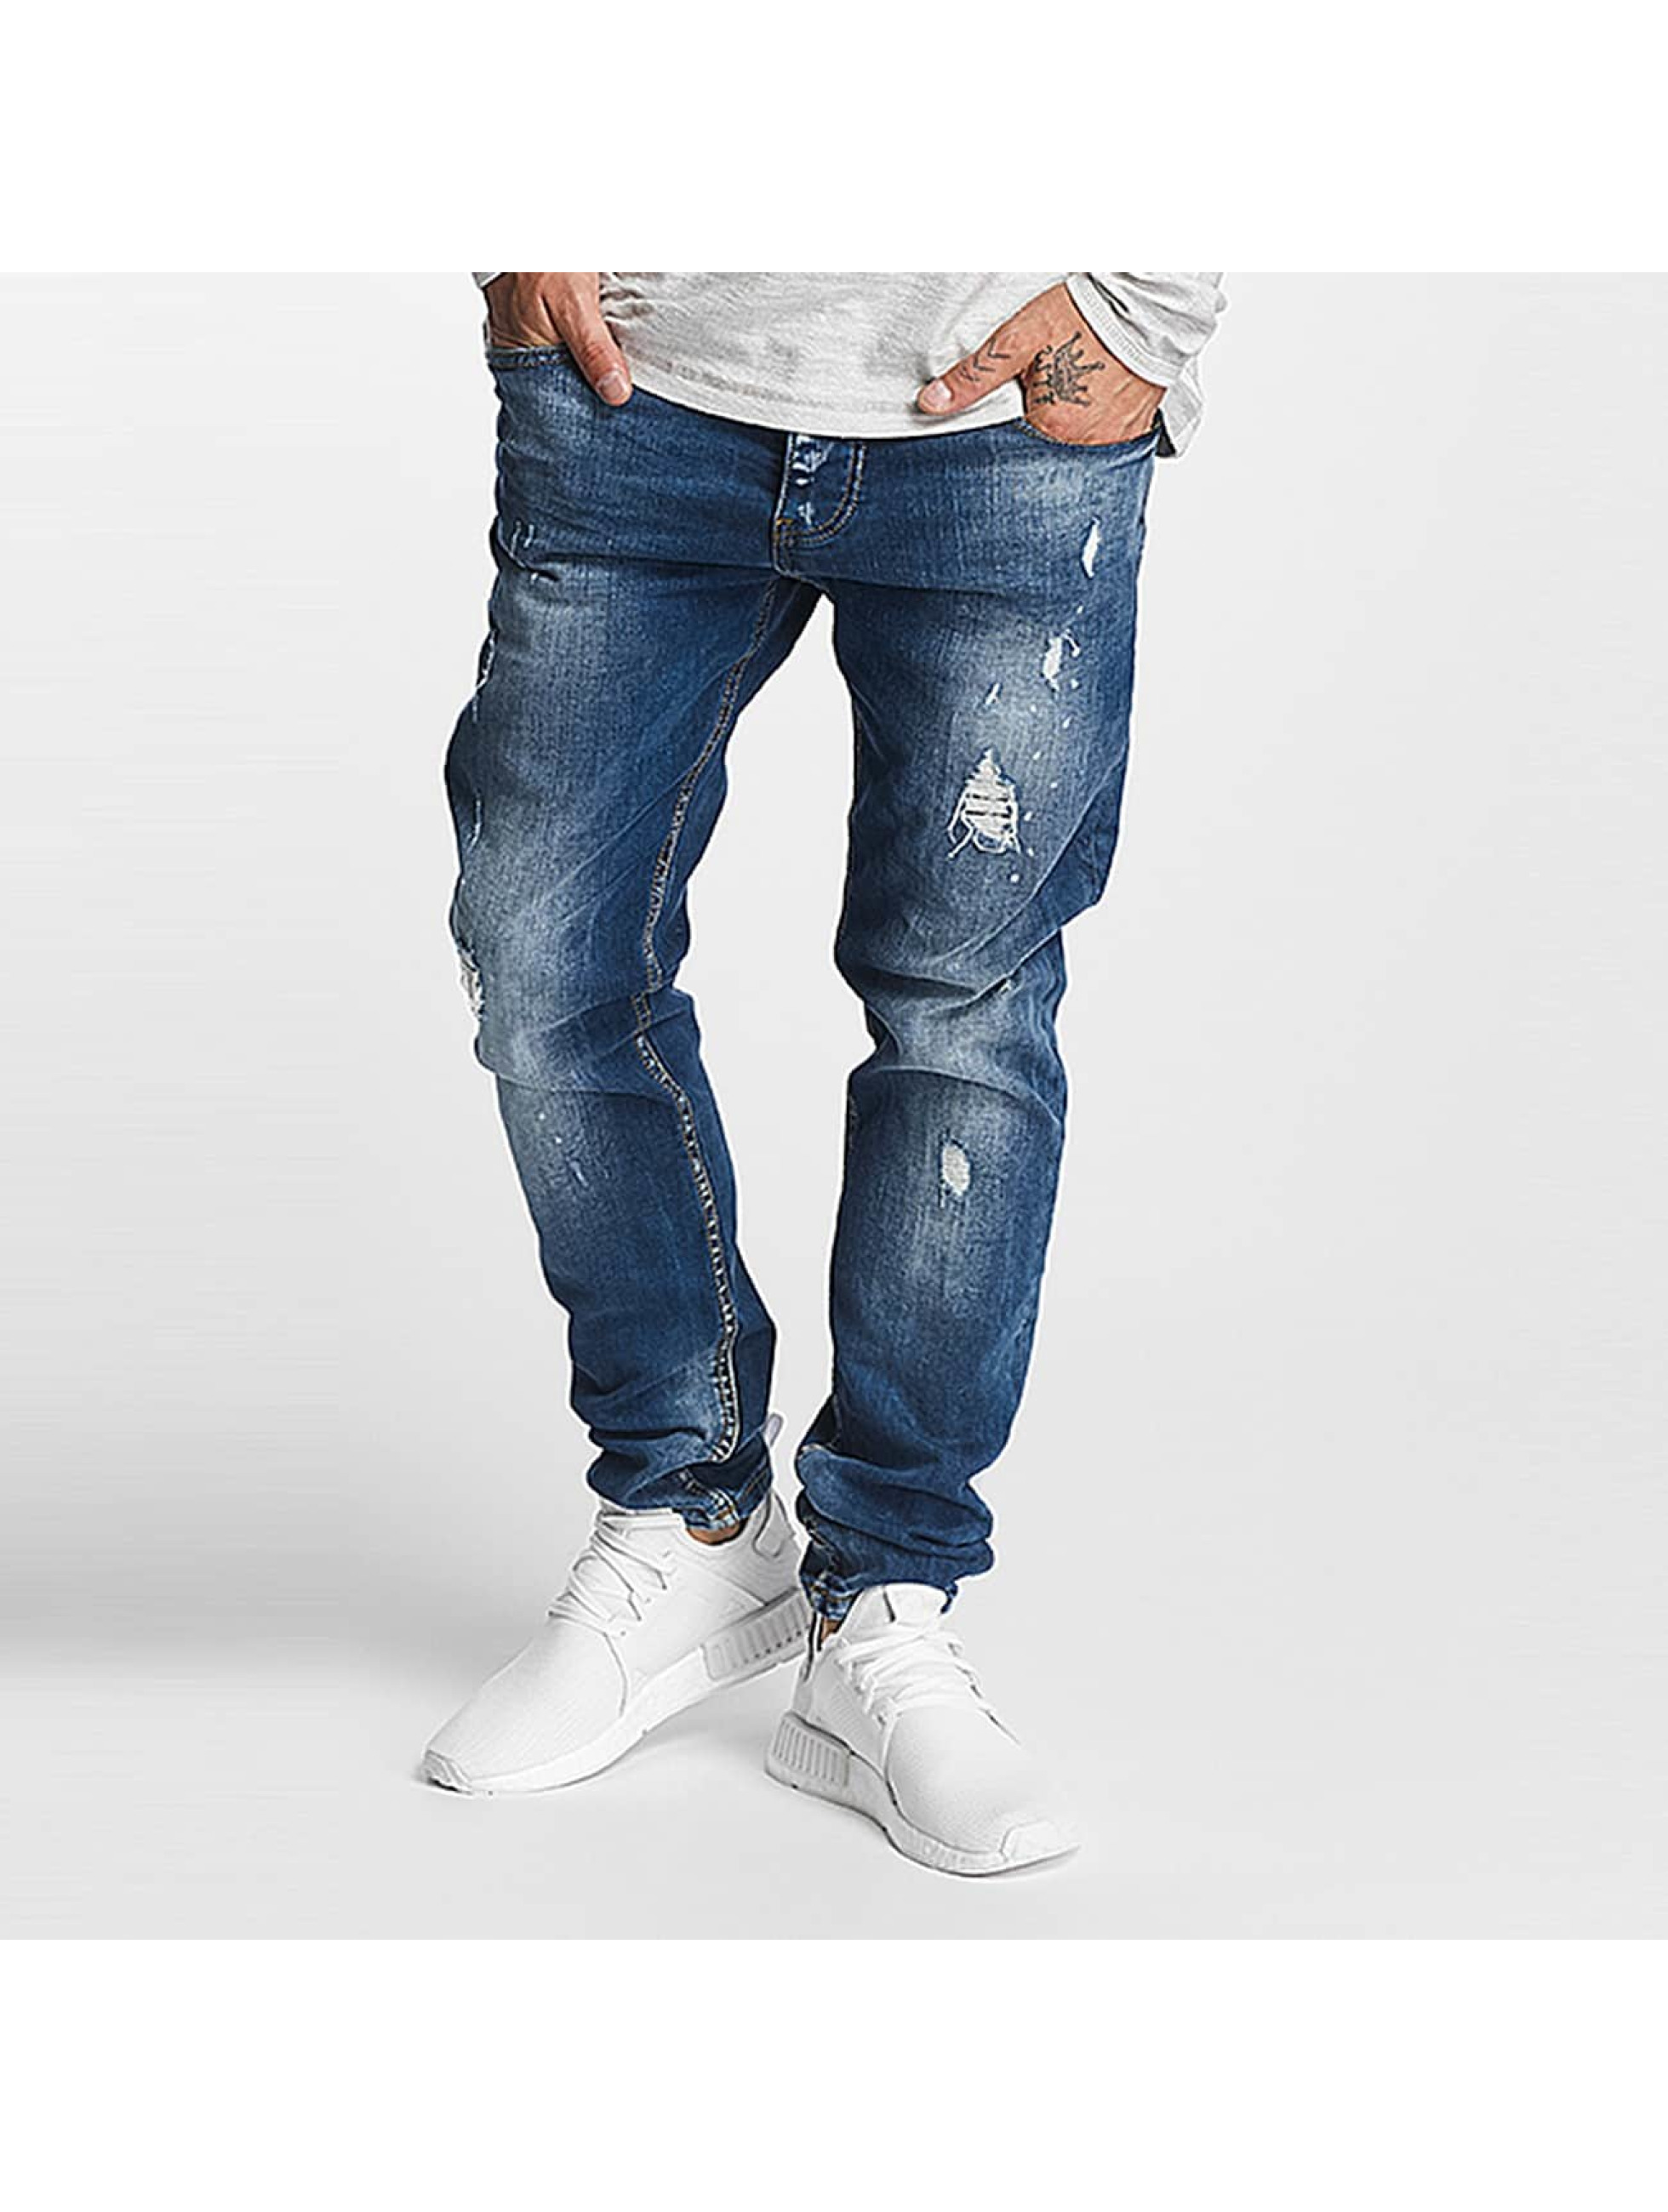 Cavallo de Ferro Männer Slim Fit Jeans Alonso in blau